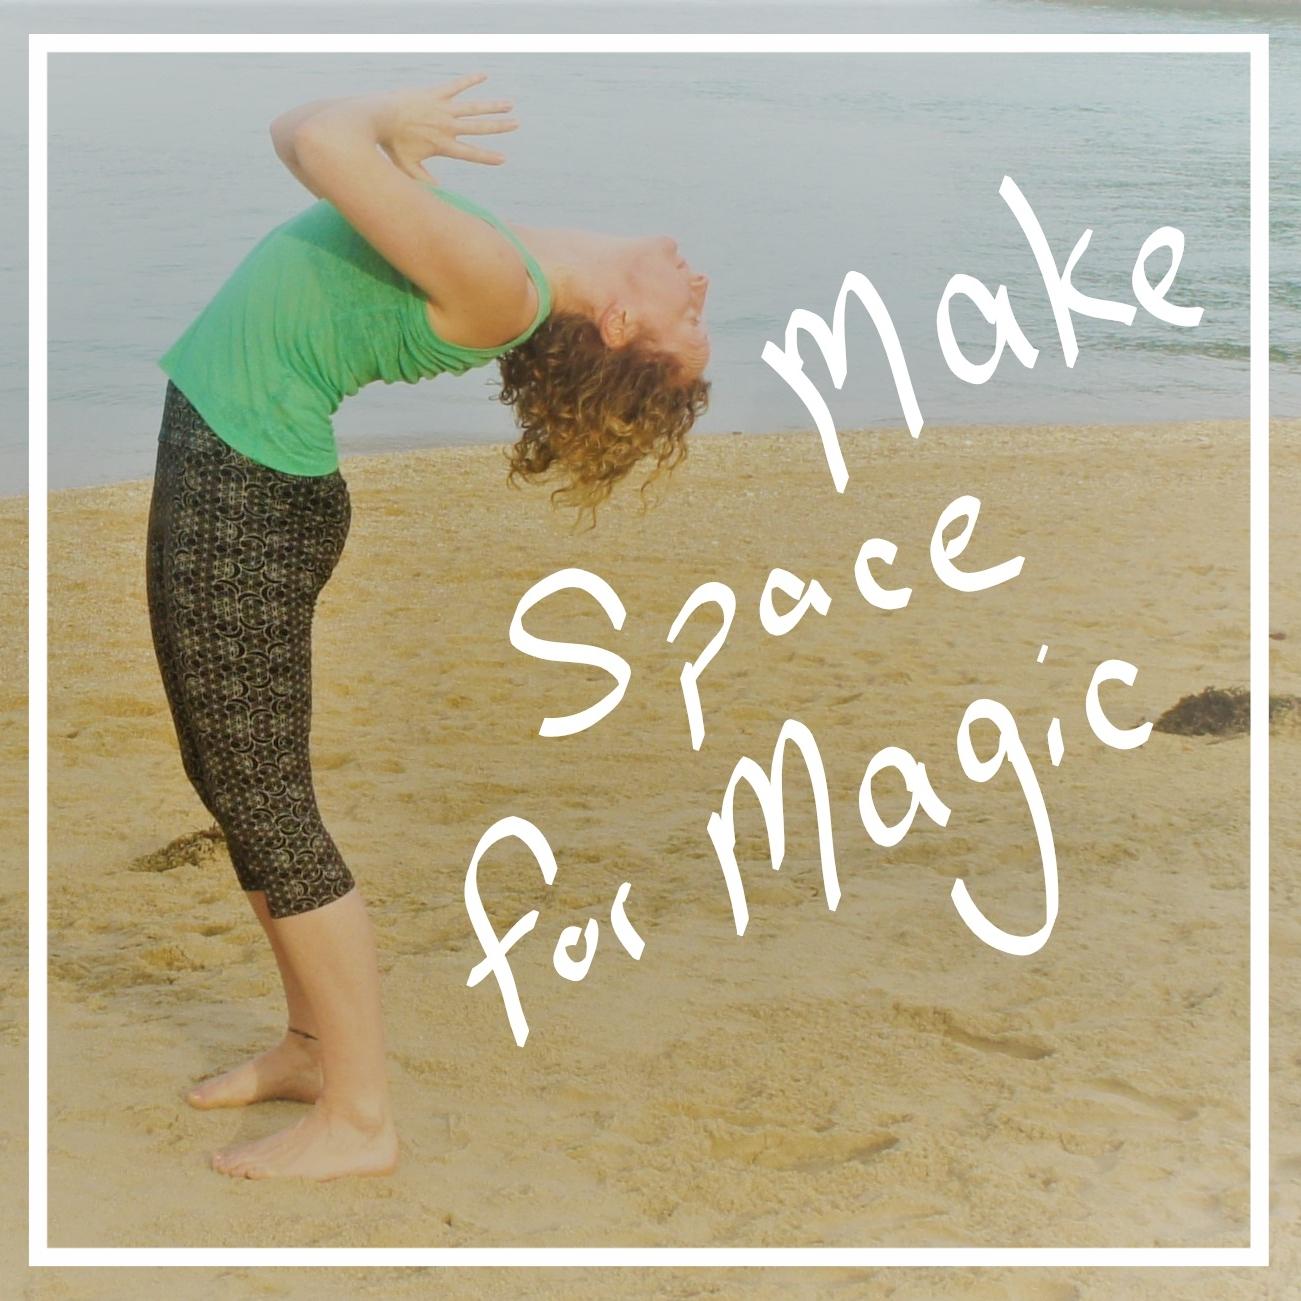 MakeSpaceForMagic